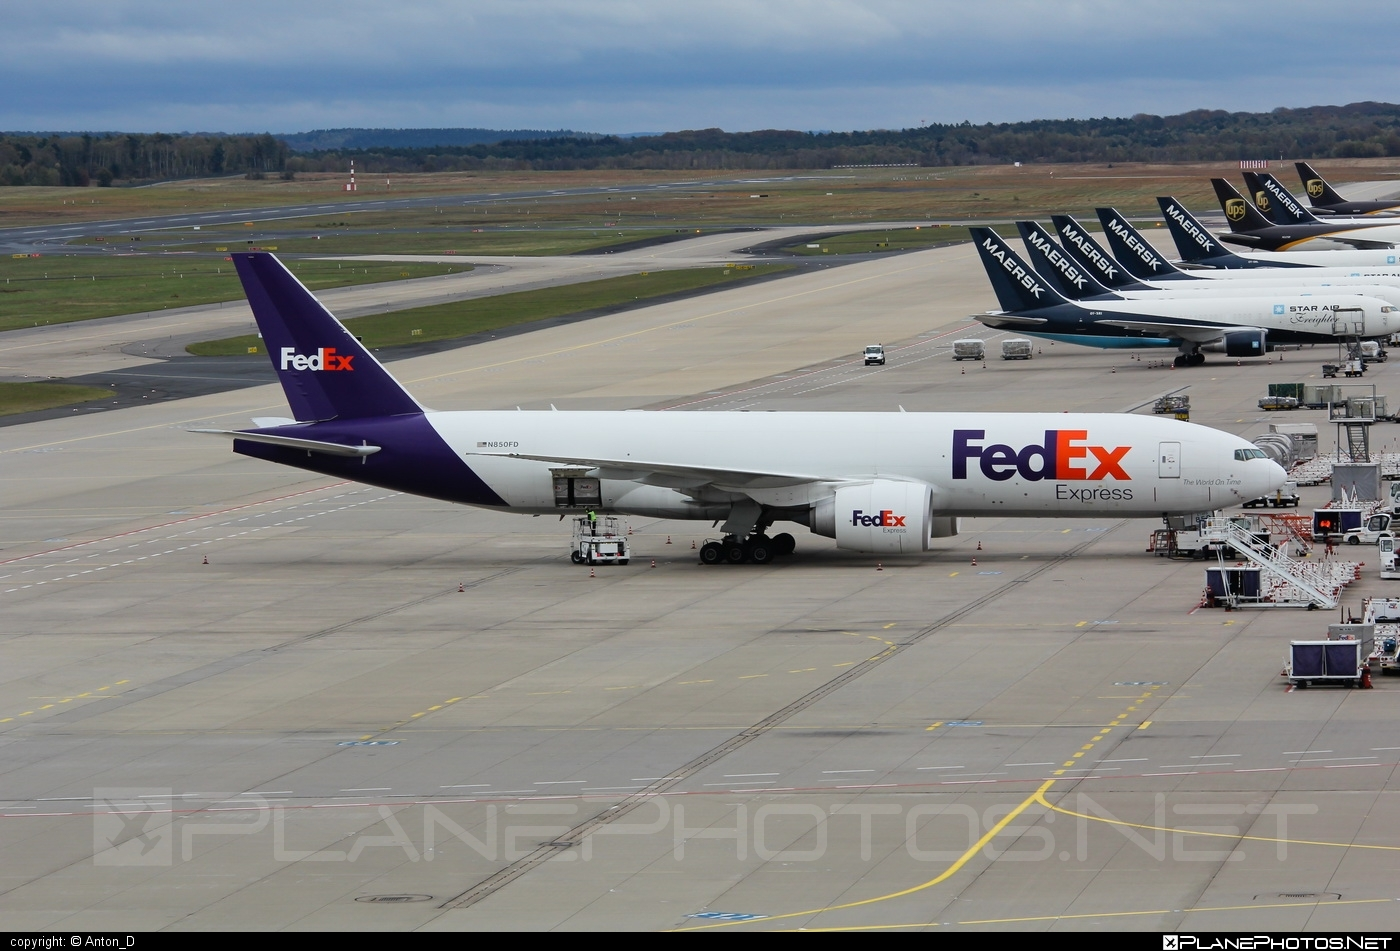 Boeing 777F - N850FD operated by FedEx Express #b777 #b777f #b777freighter #boeing #boeing777 #fedex #fedexairlines #fedexexpress #tripleseven